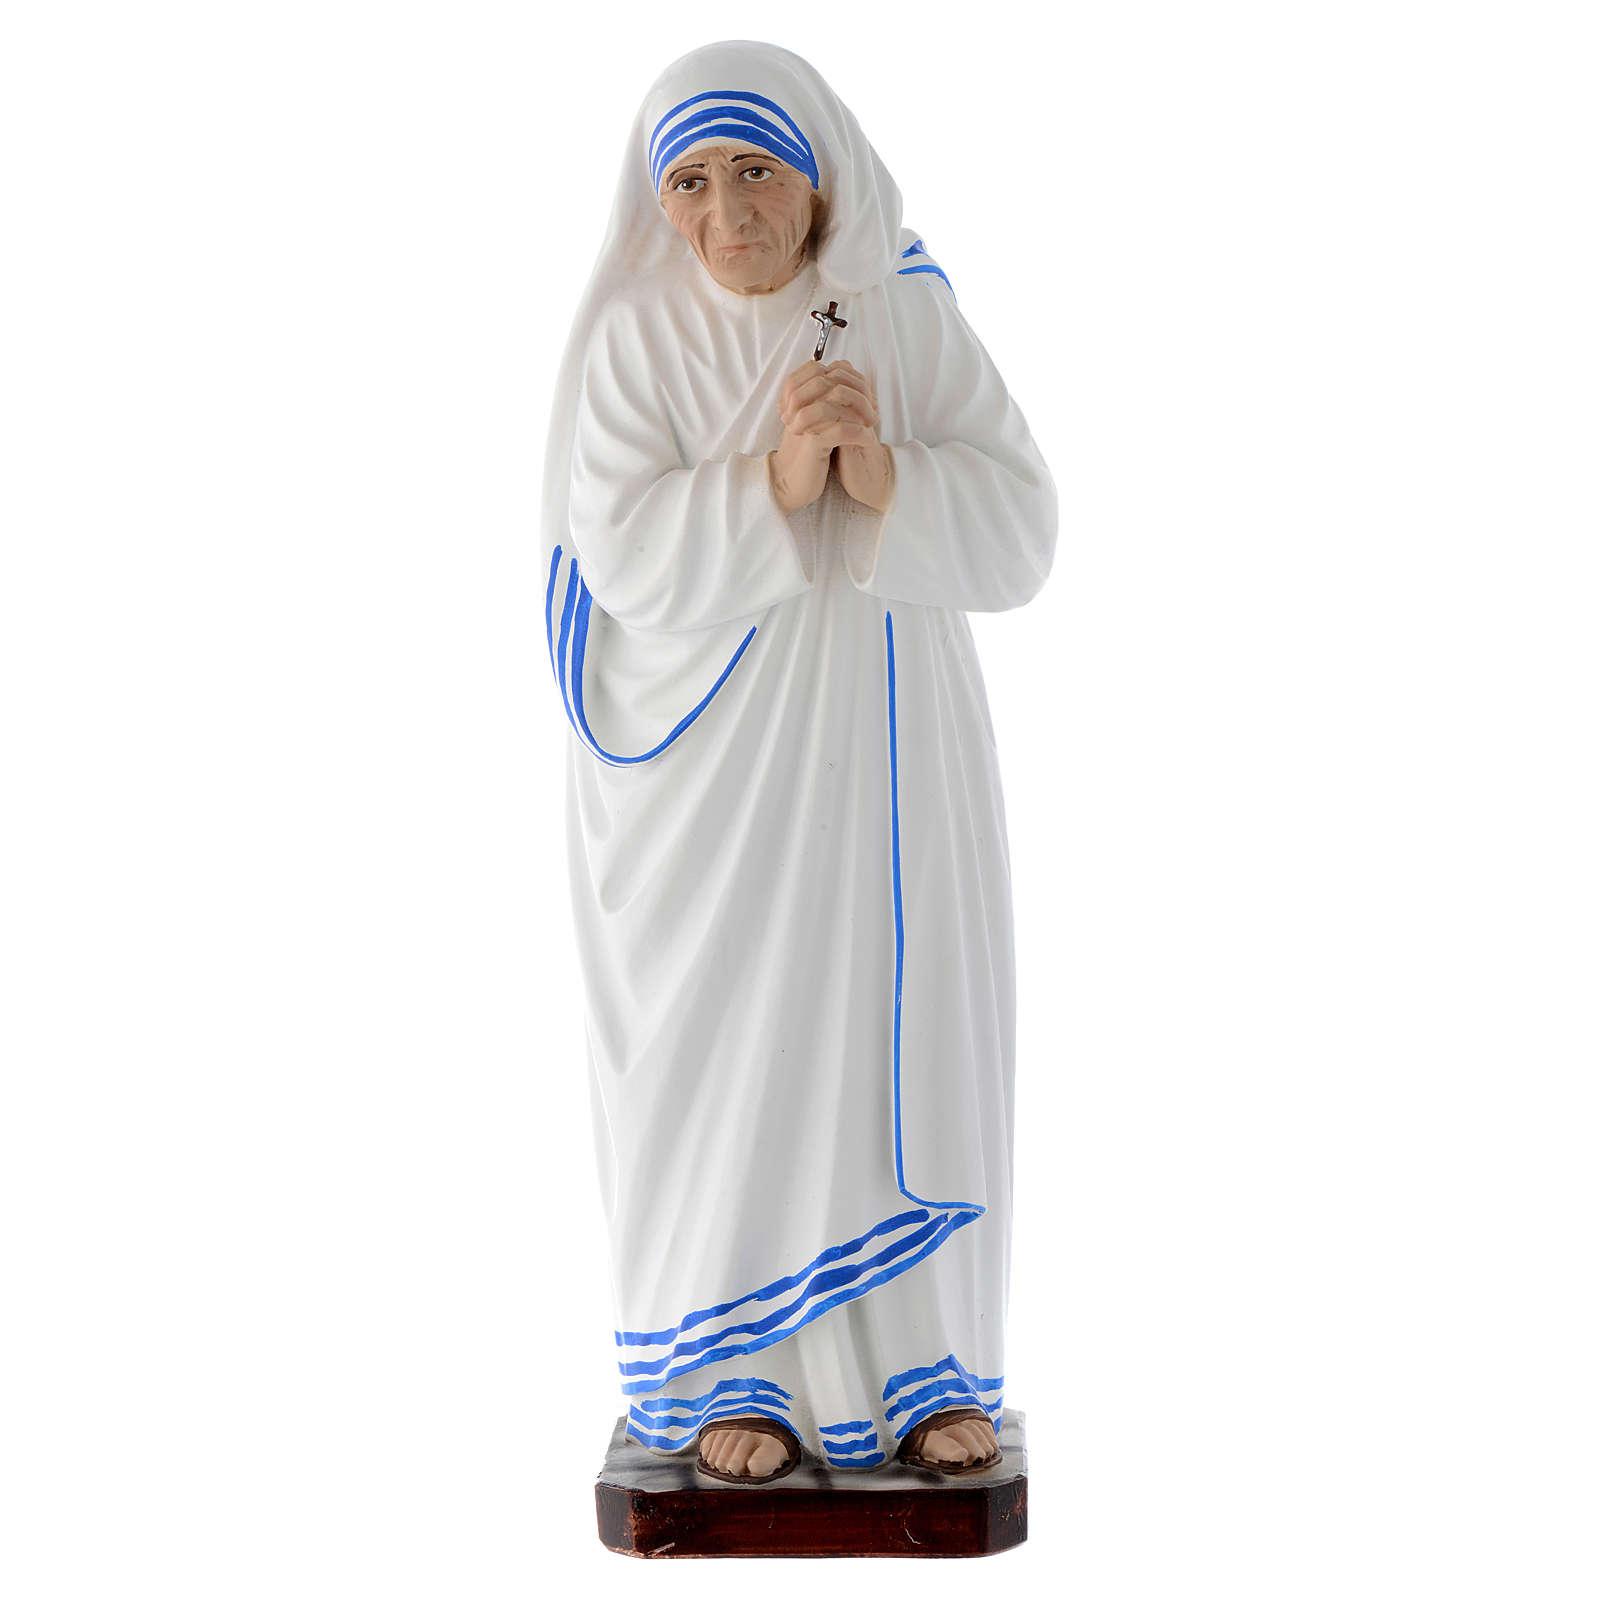 Statua Santa Madre Teresa di Calcutta 30 cm vetroresina 4